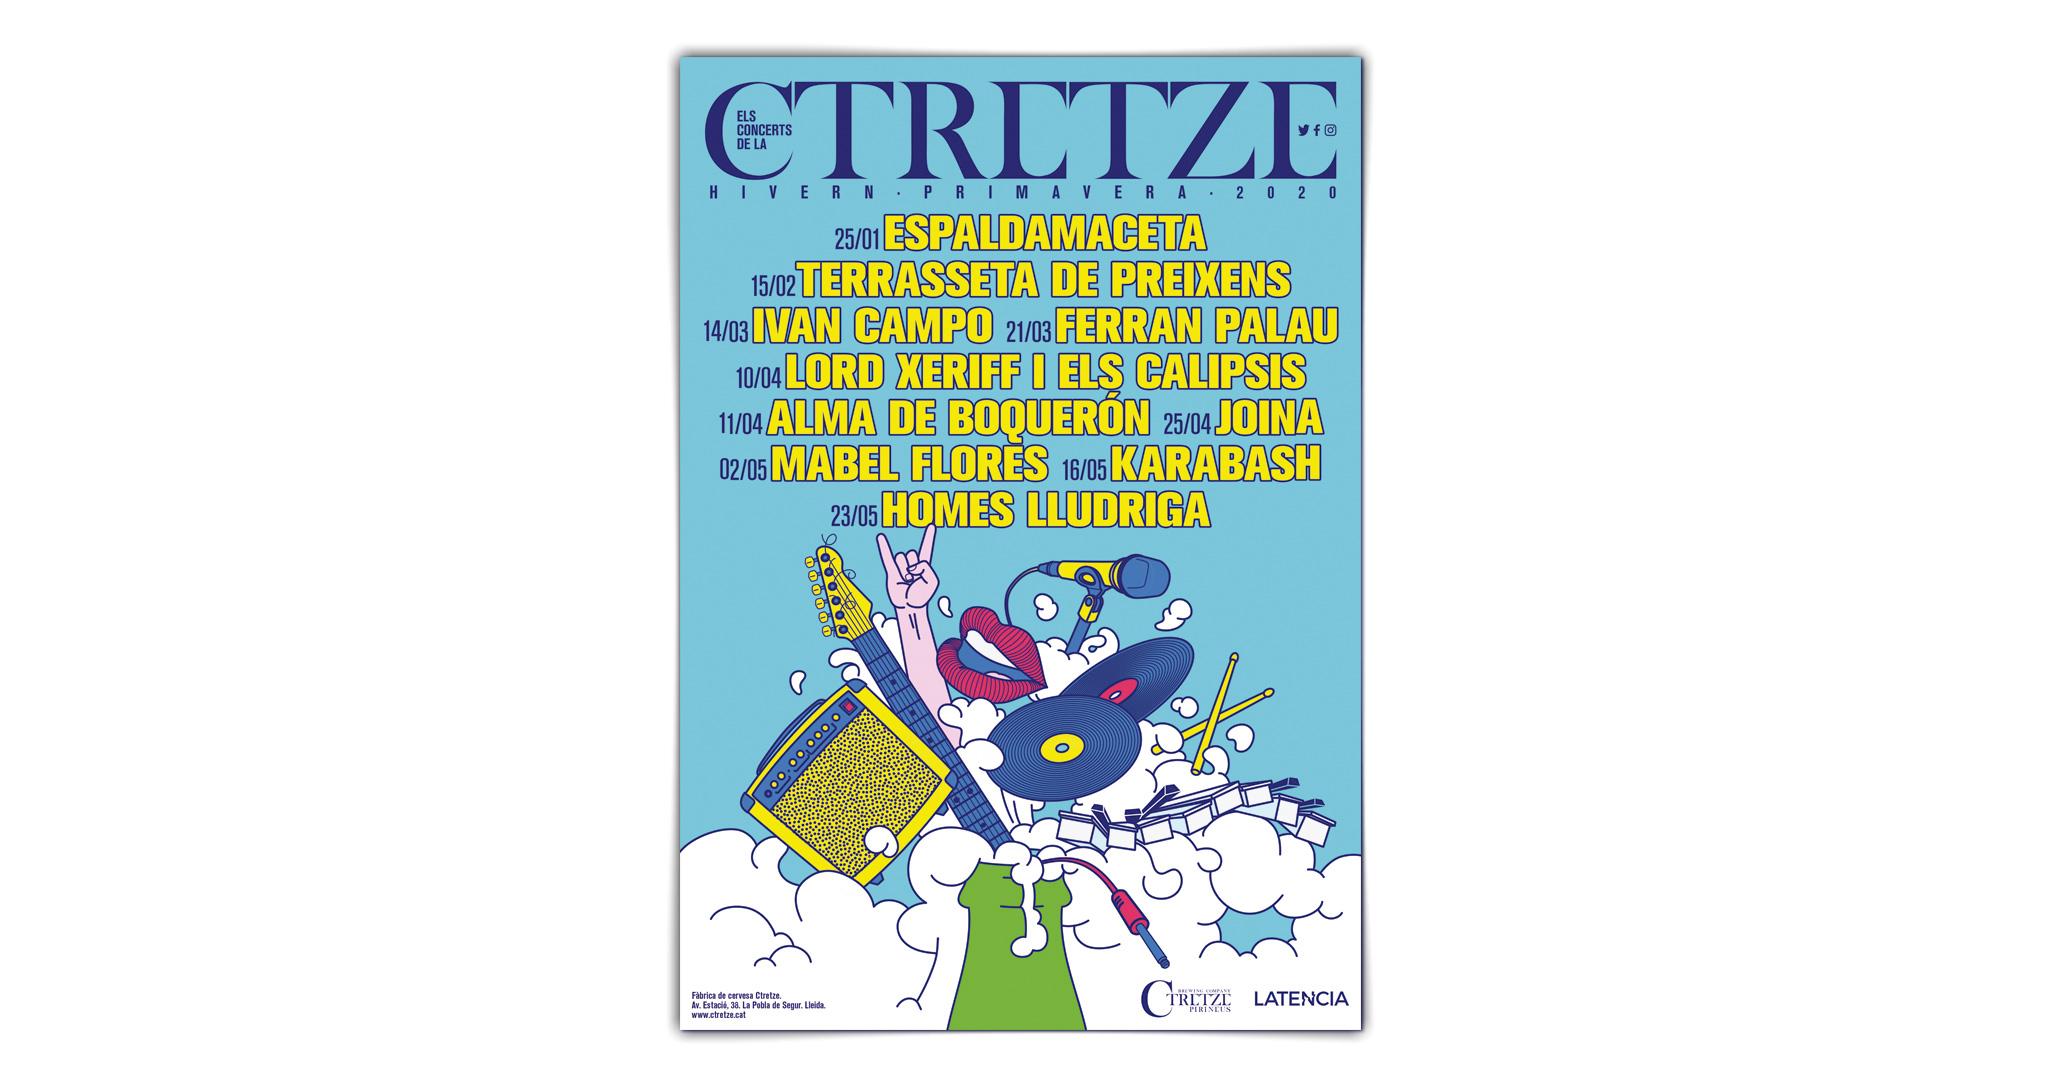 Poster Festival Ctretze